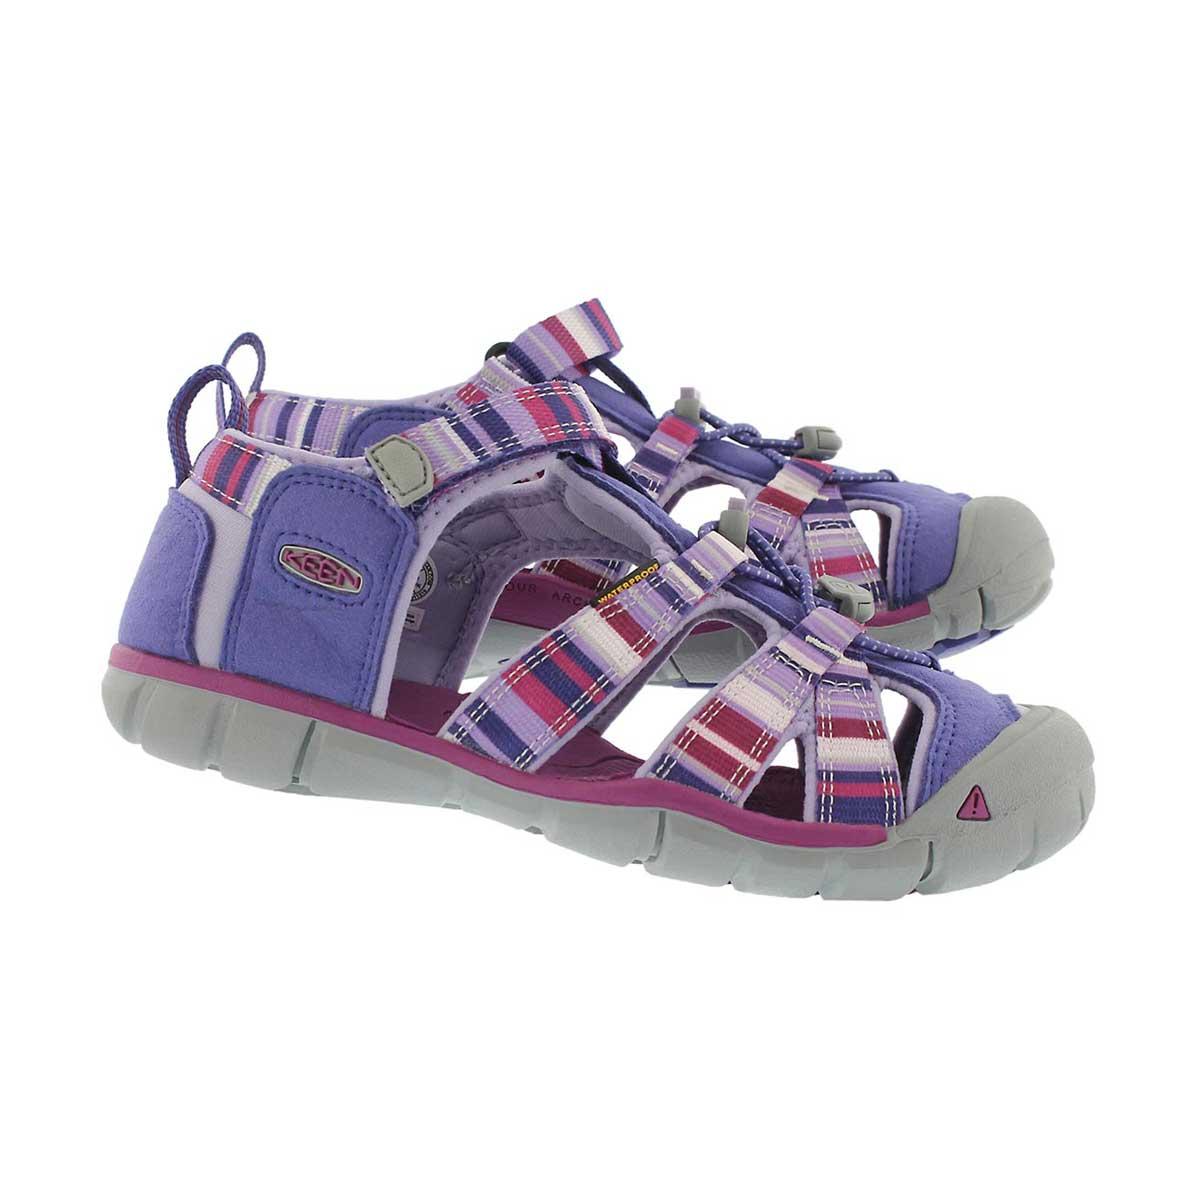 Sandales sport SEACAMP II, Liberty raya, filles